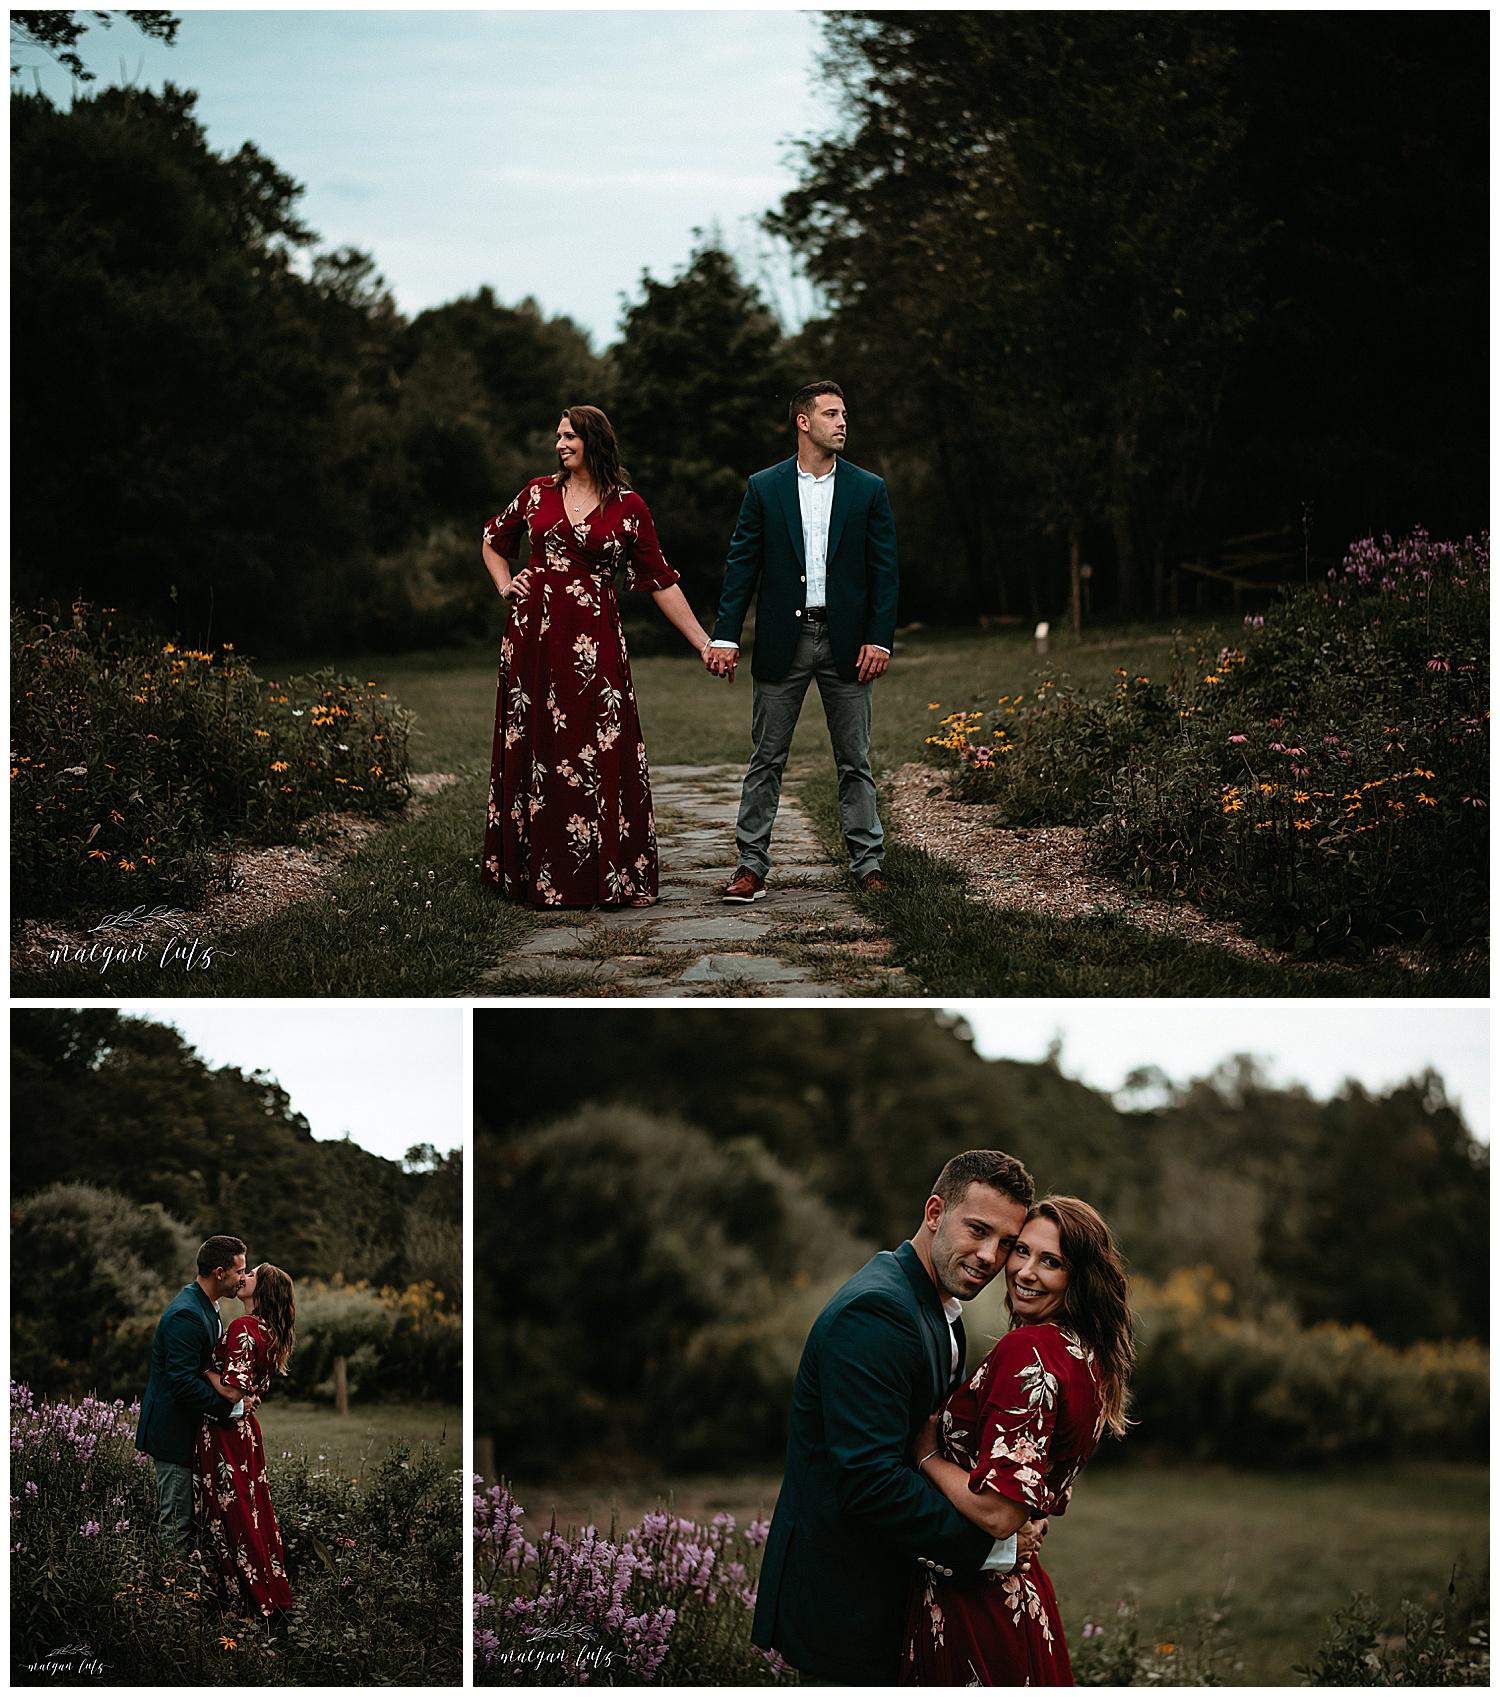 NEPA-Bloomgsburg-Wedding-Photographer-in-the-Lehigh-Valley_0018.jpg